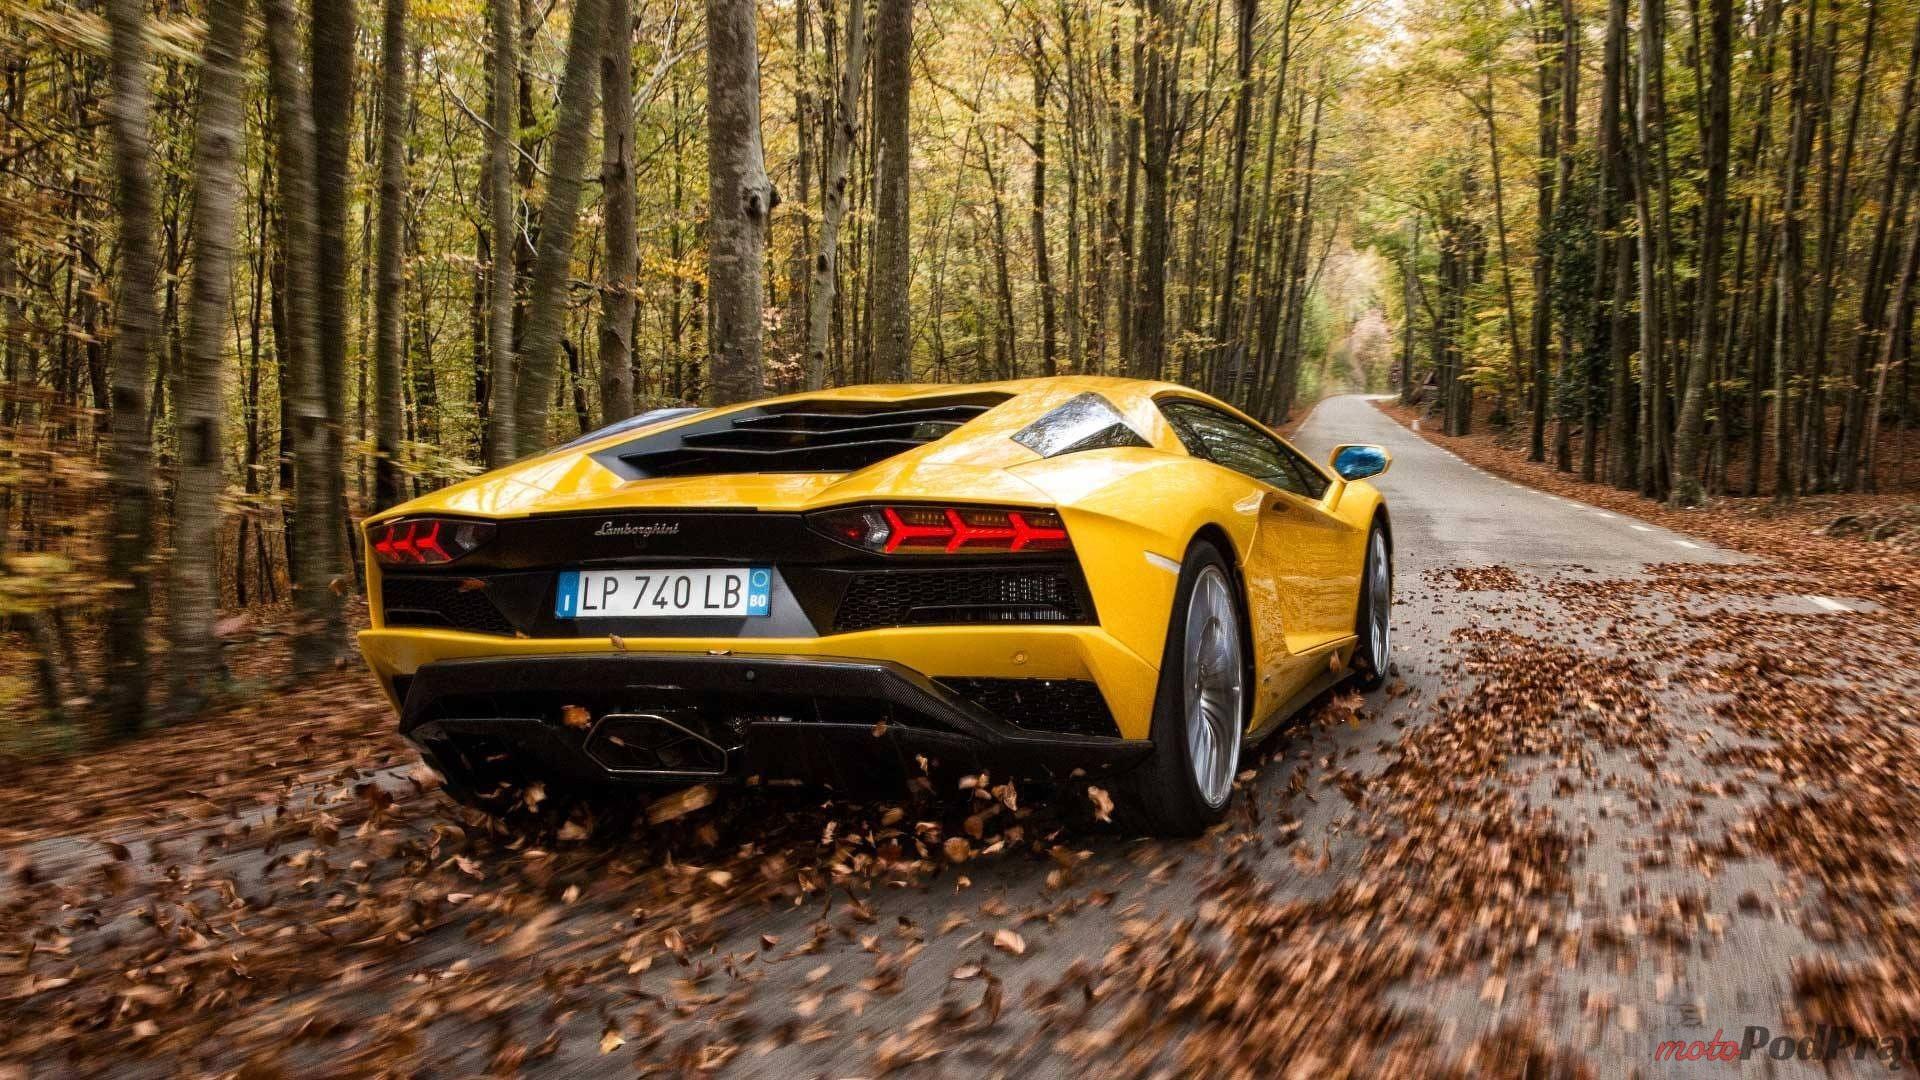 2017 lamborghini aventador s 3 Poprawić doskonałość: Lamborghini Aventador S